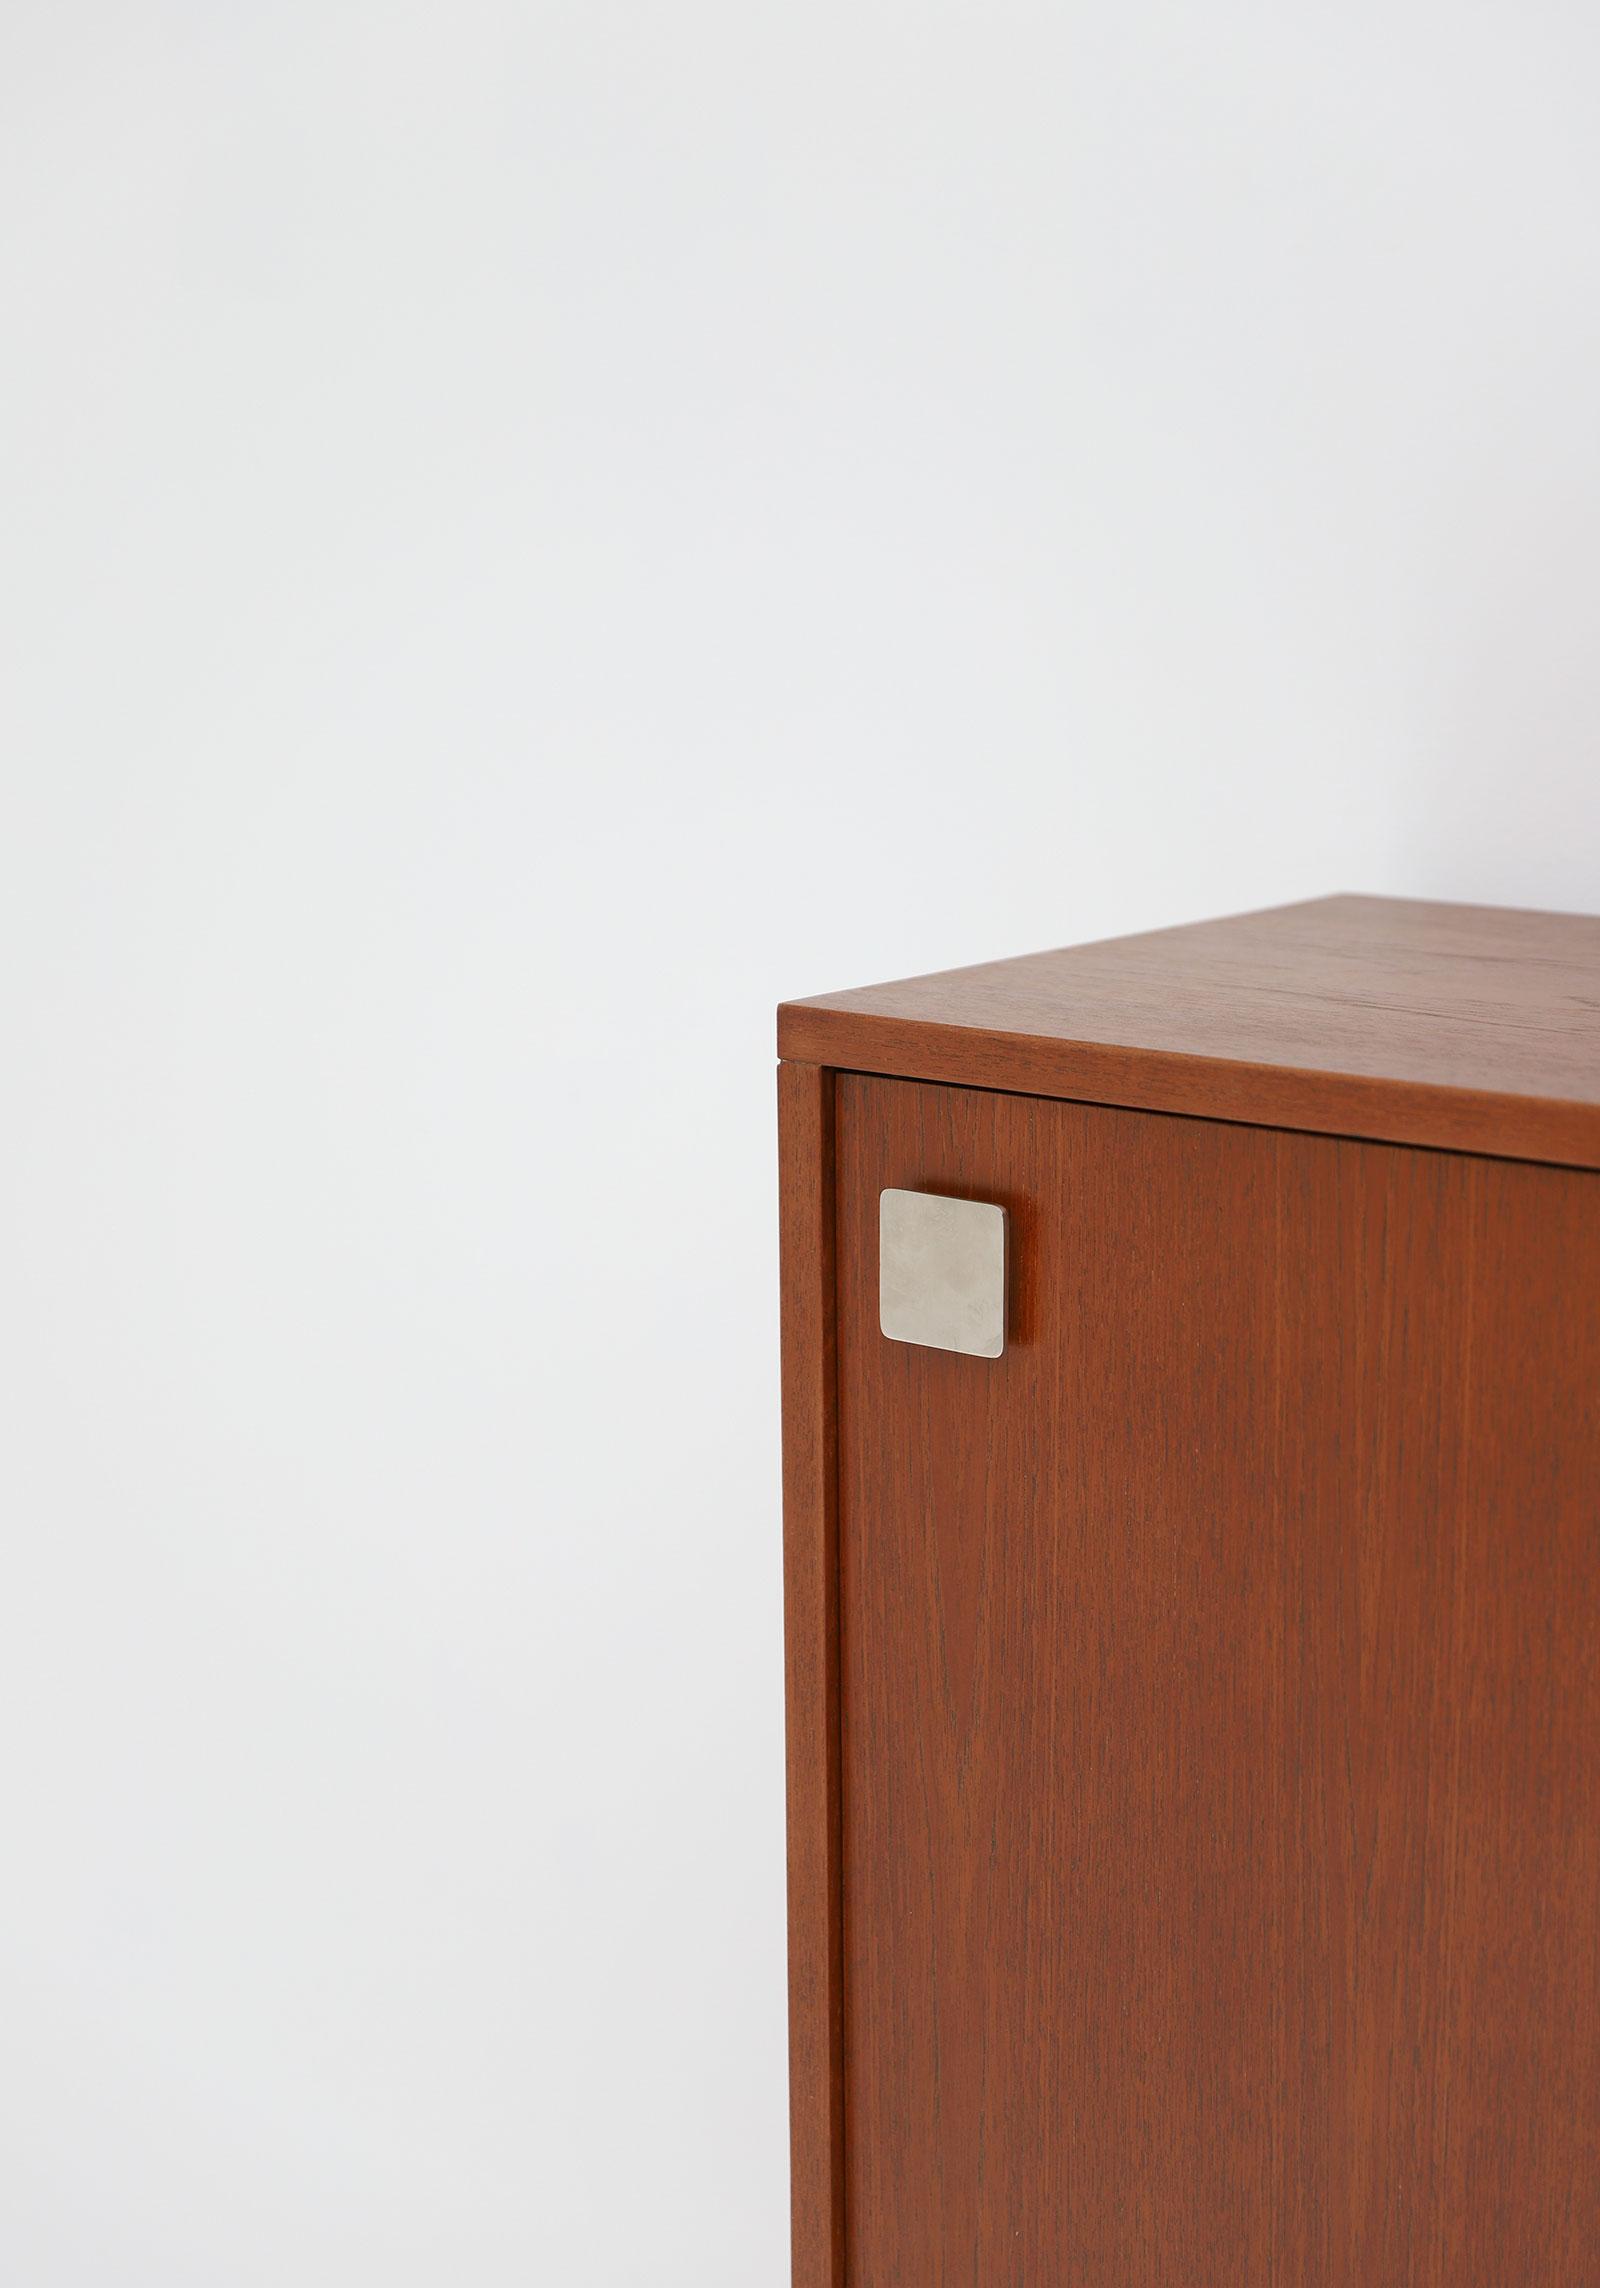 Alfred Hendrickx Belform Cabinetimage 4